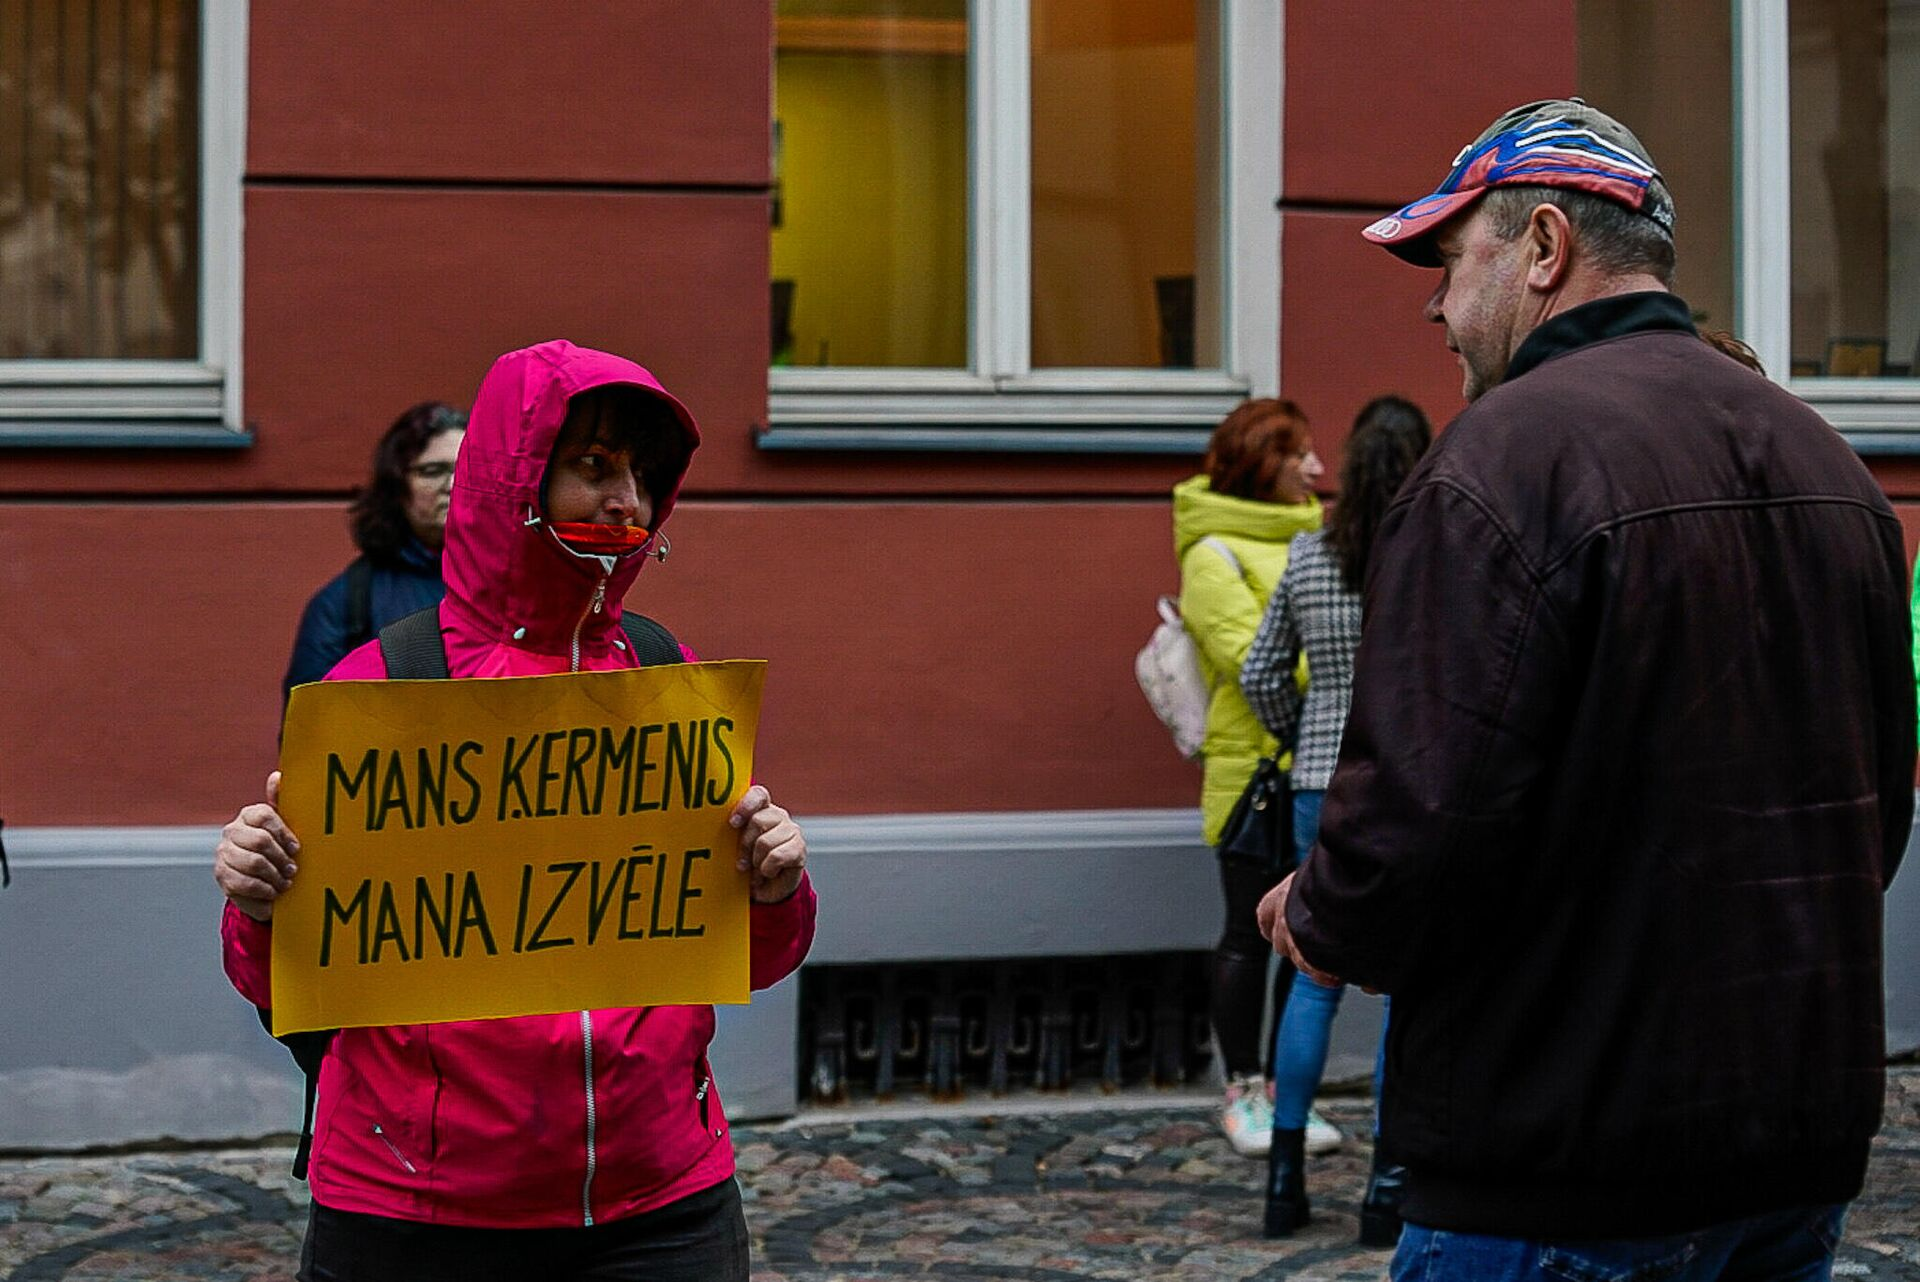 Акция протеста у Сейма Латвии - Sputnik Латвия, 1920, 14.10.2021